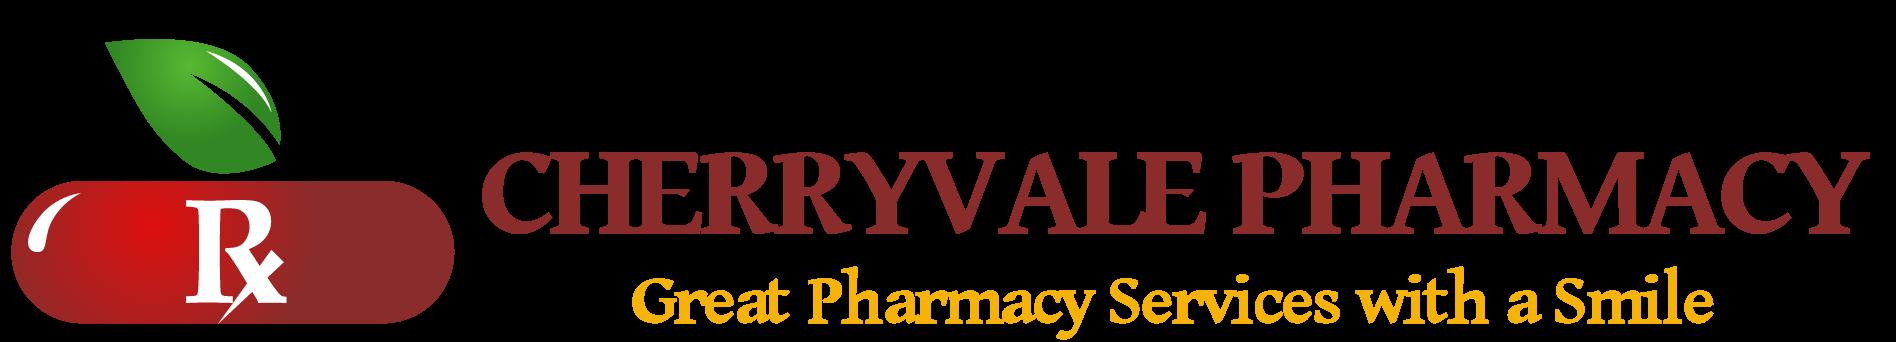 Cherryvale Pharmacy